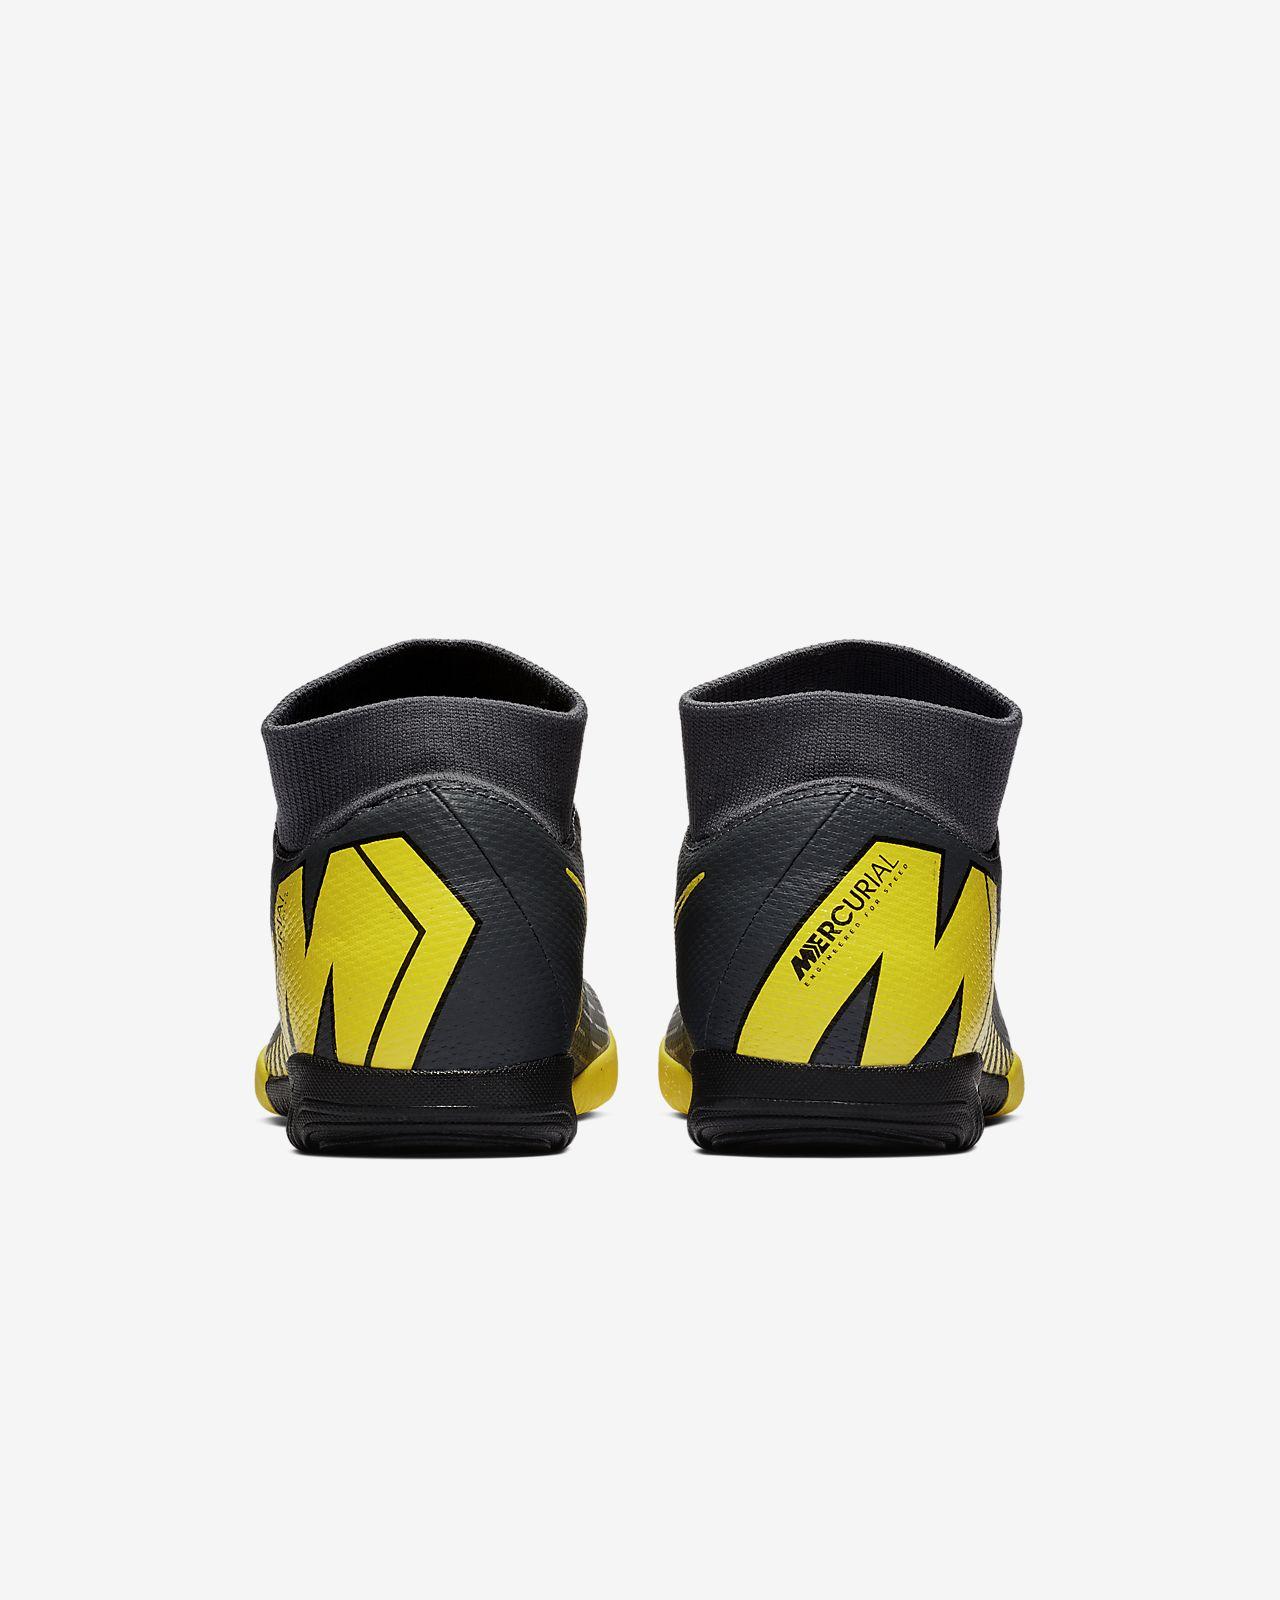 c83c7c452c7 Nike SuperflyX 6 Academy IC Indoor Court Football Boot. Nike.com CH